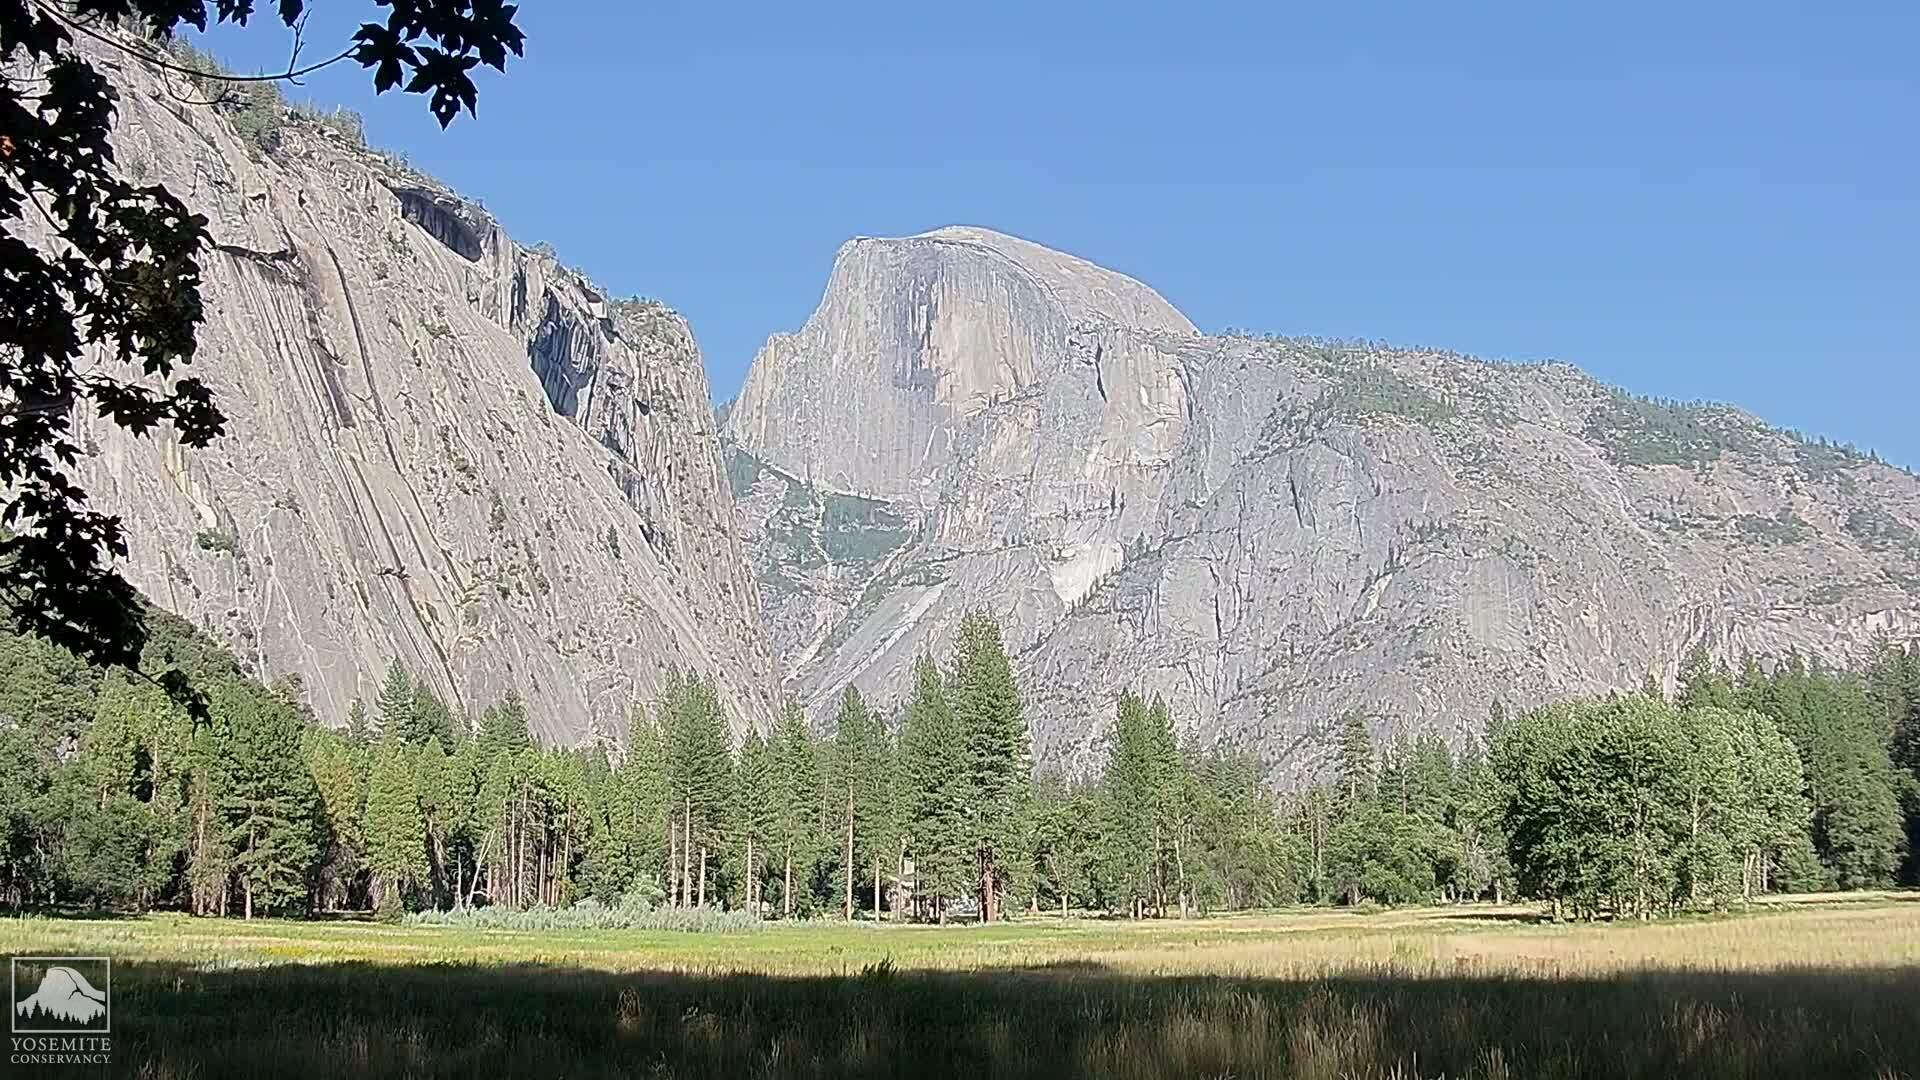 Yosemite-Nationalpark, Kalifornien Sa. 17:45